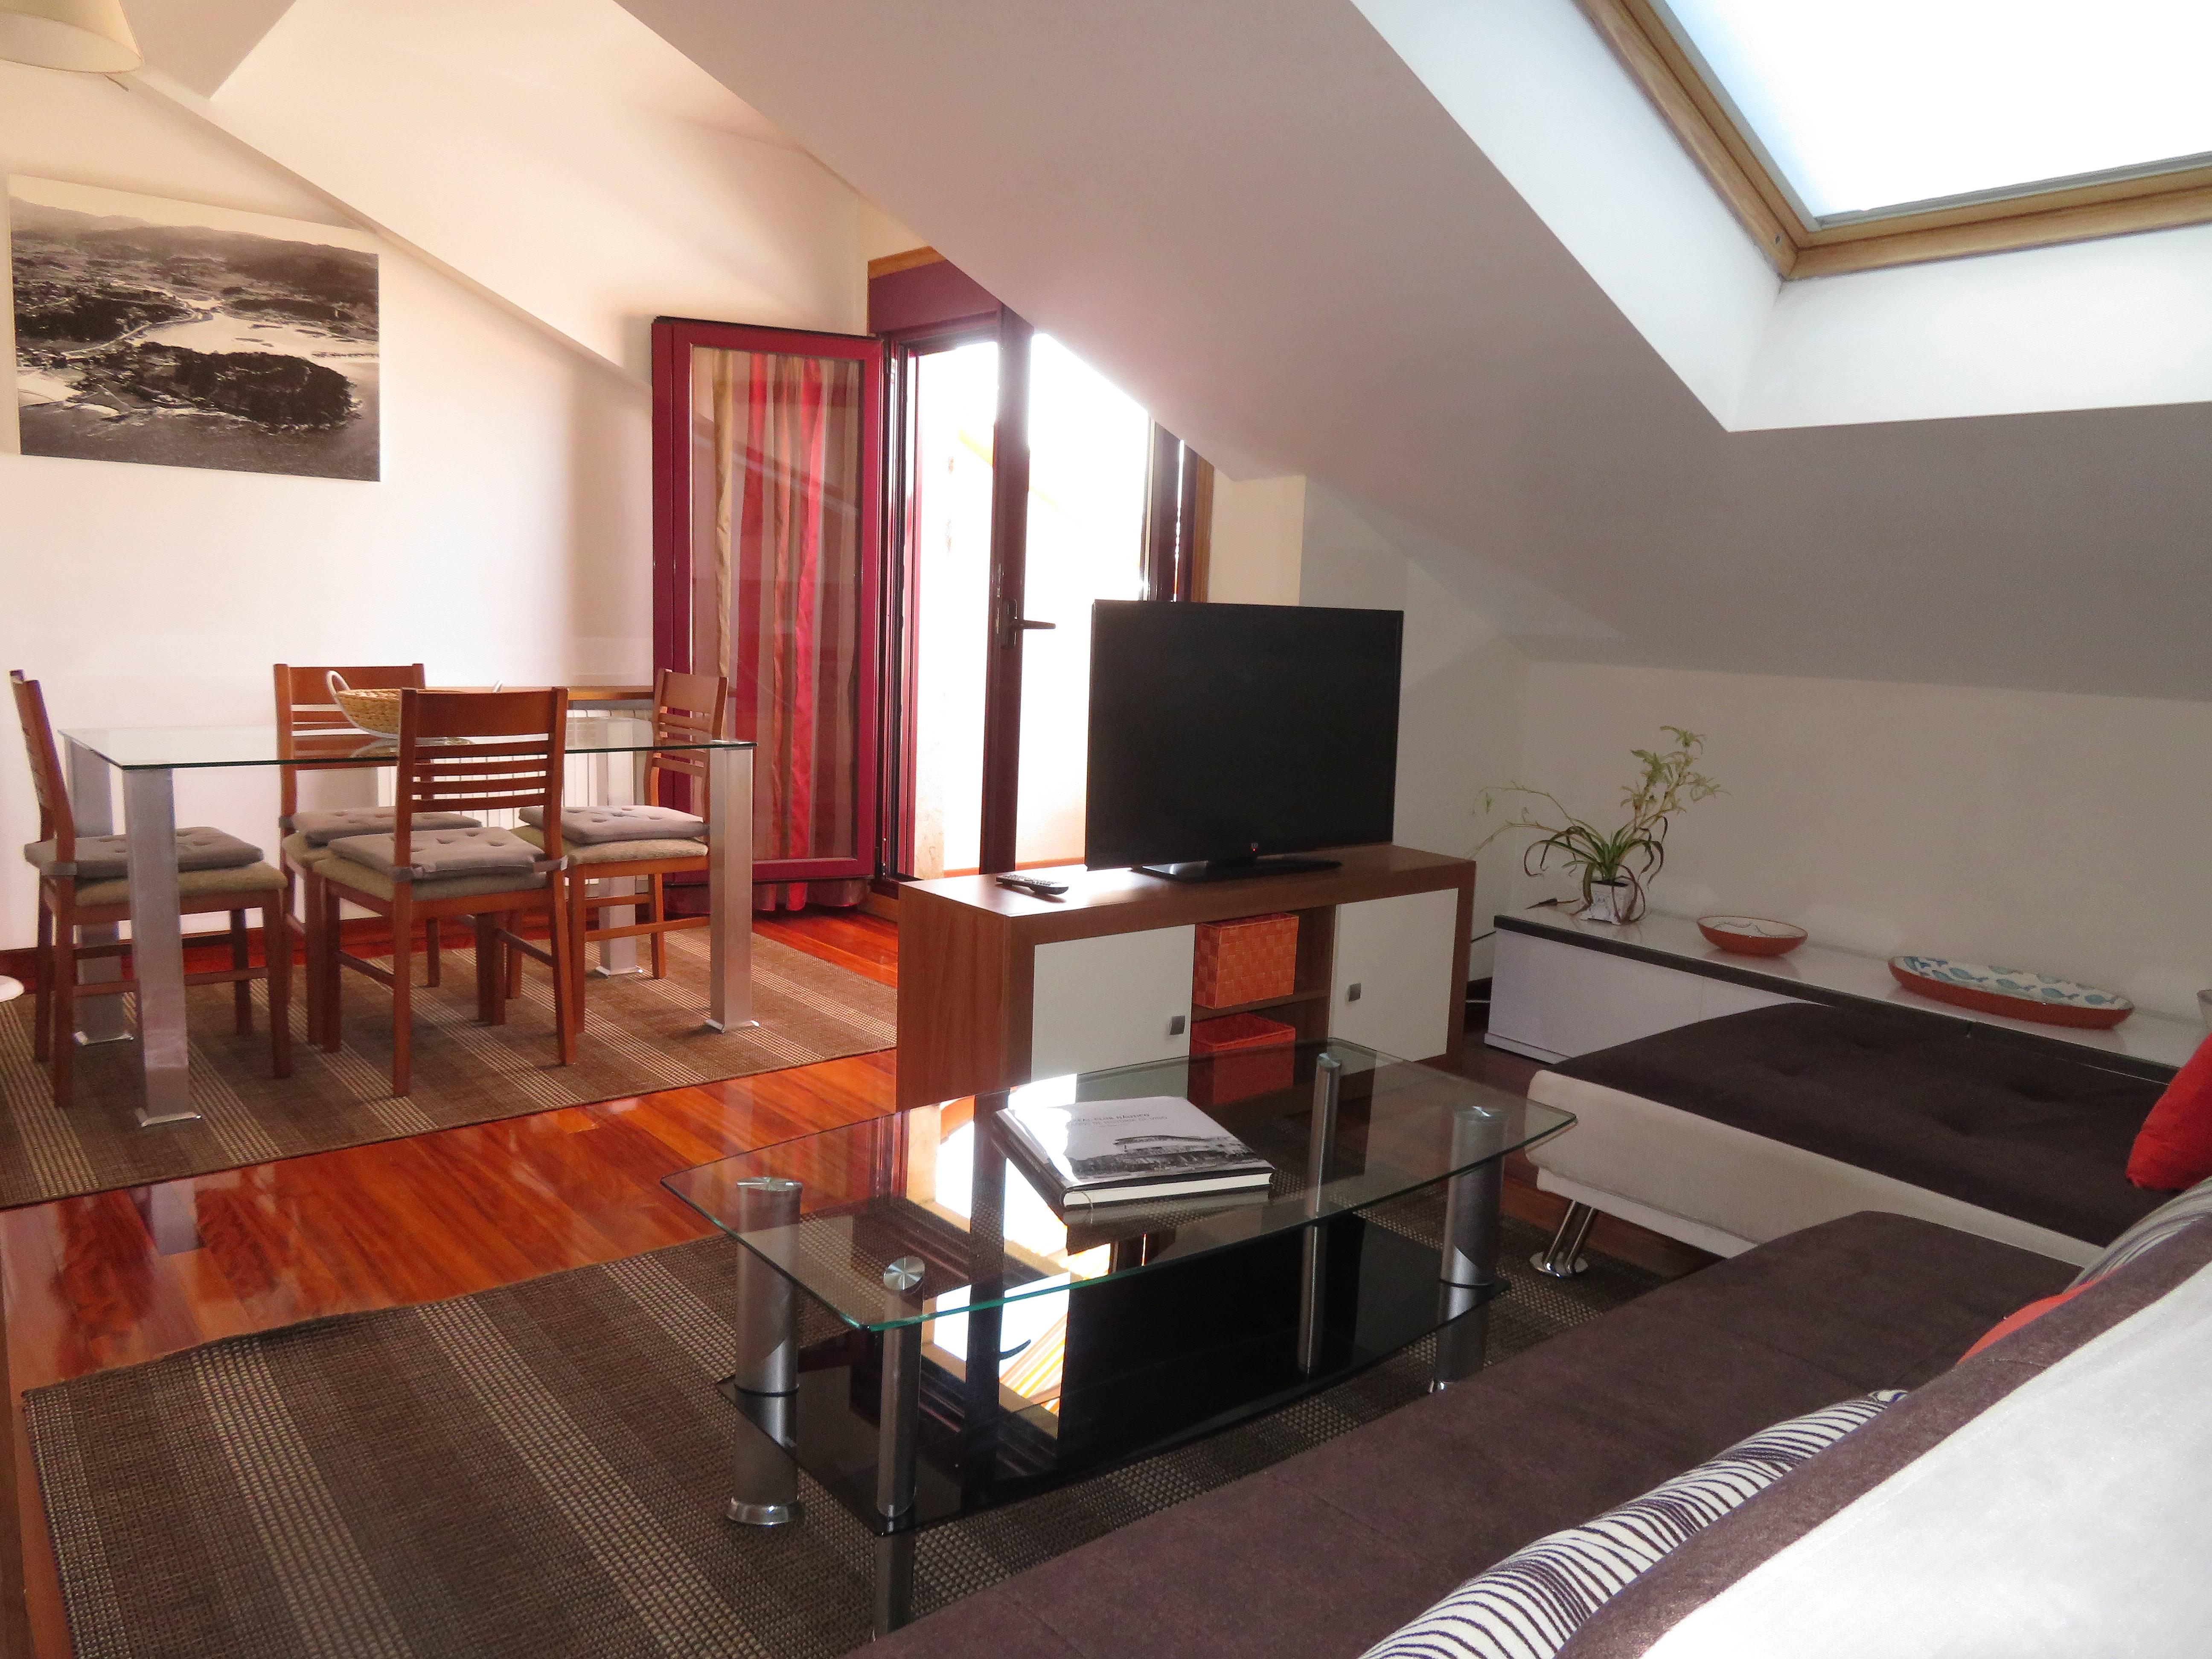 86d5327c0770a Apartamento 52m2 a 600 m de Playa Ladeira - Sabaris